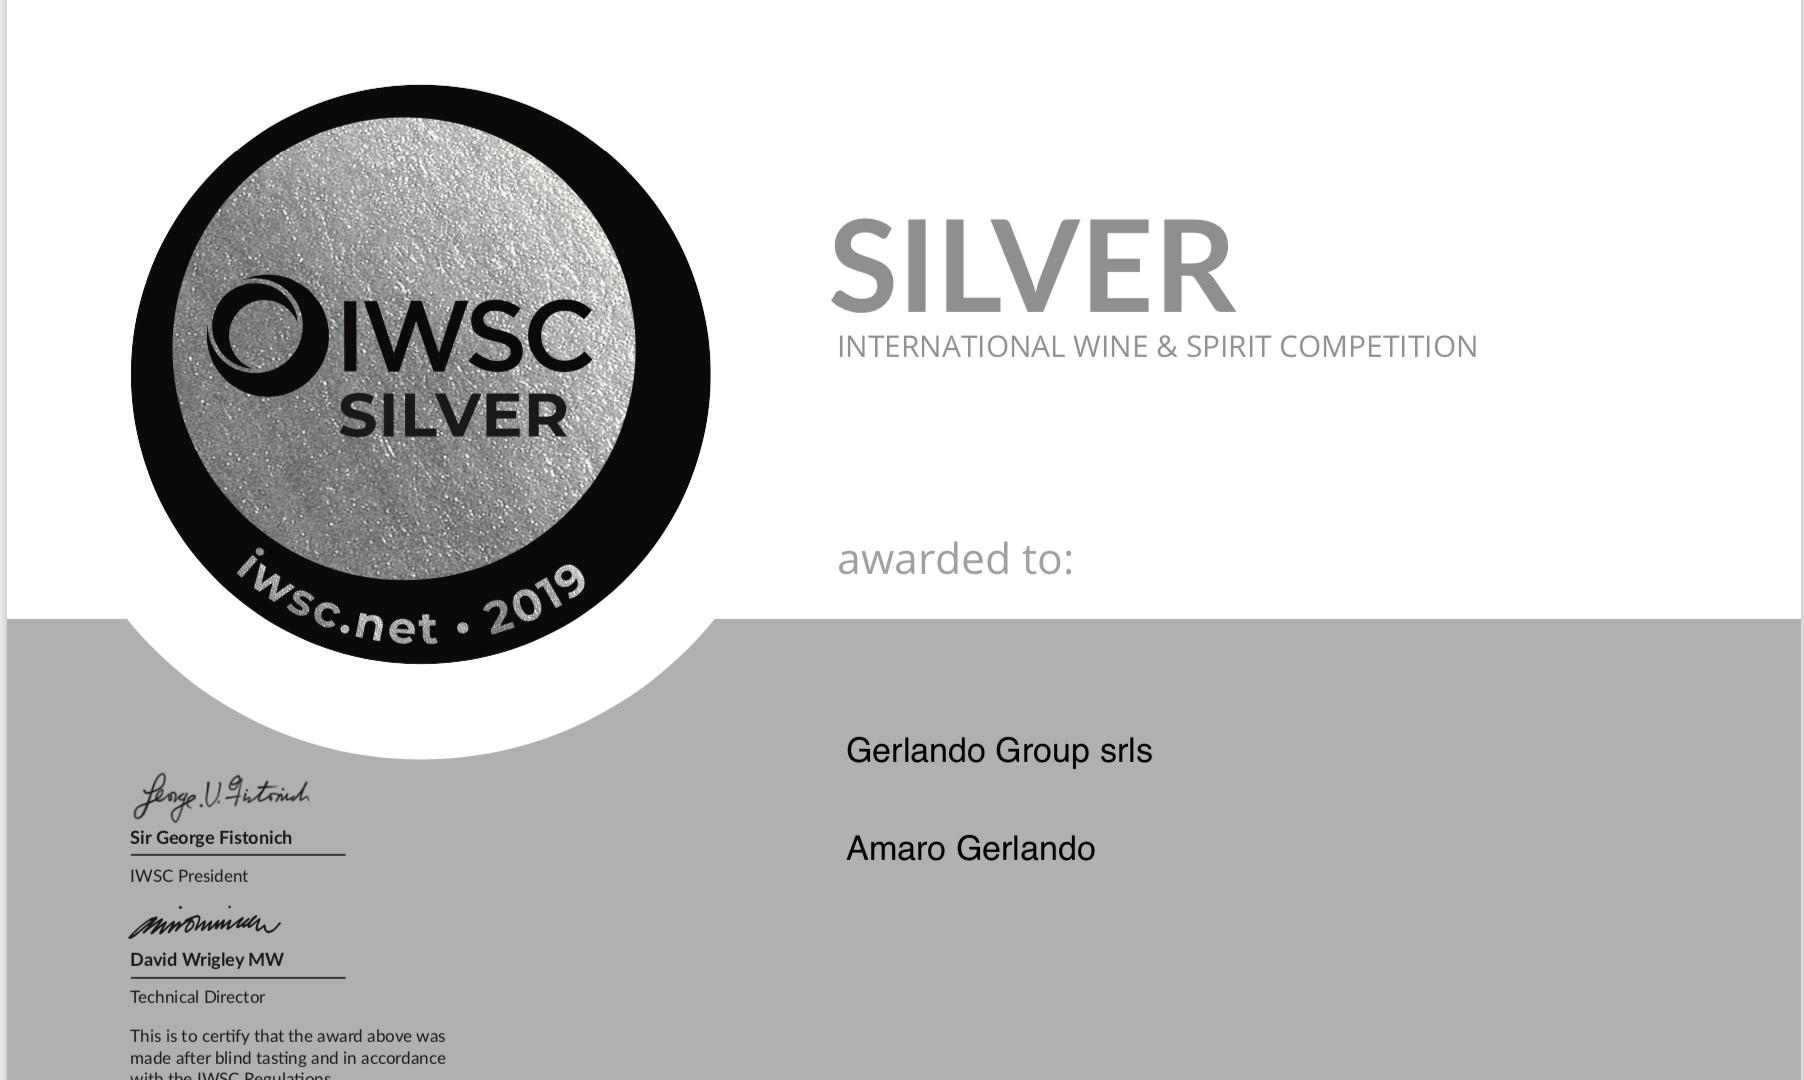 Premio-Silver-IWSC-Gerlando